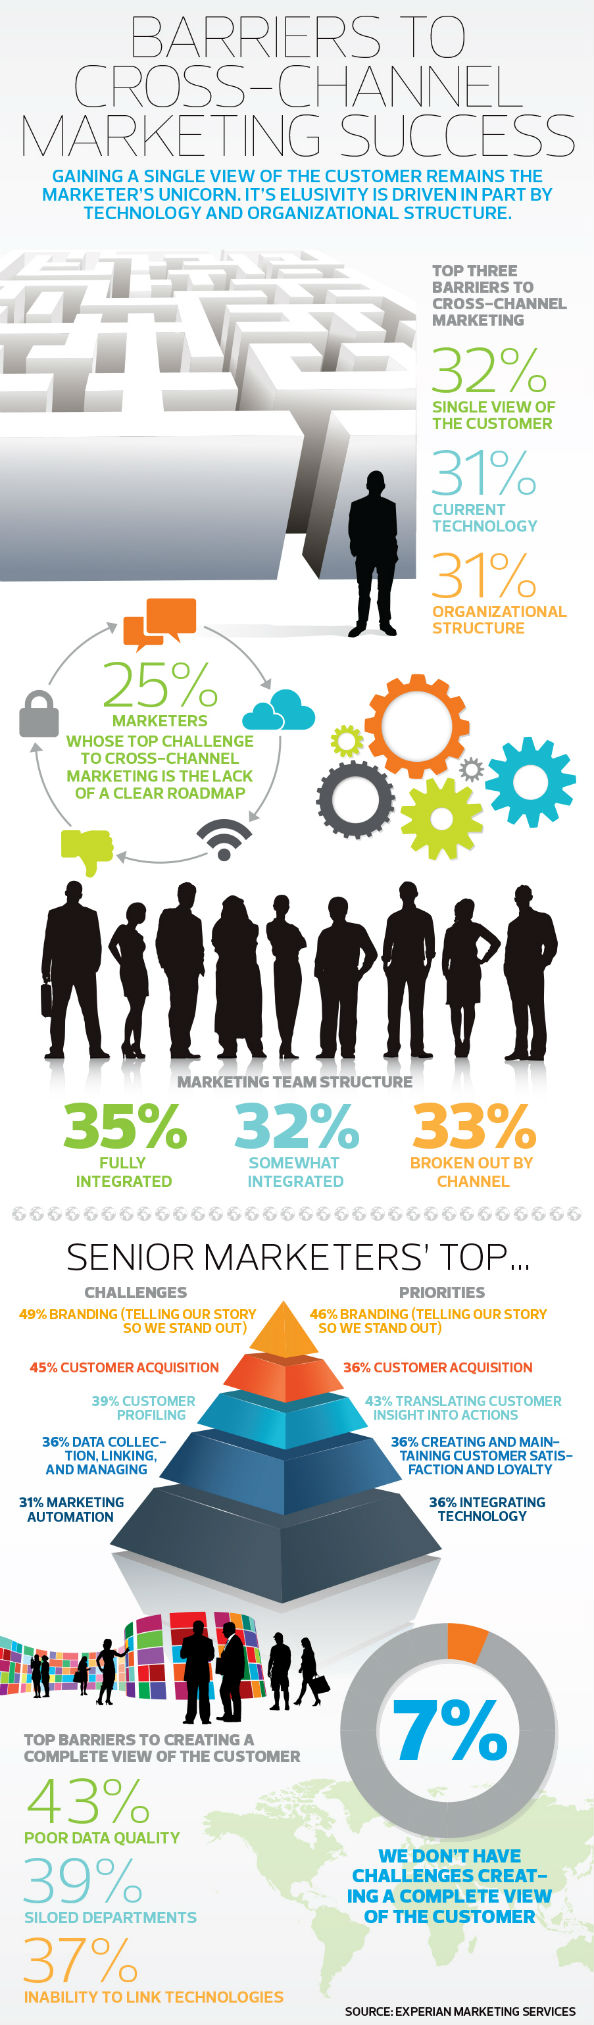 Digital Marketing News 36